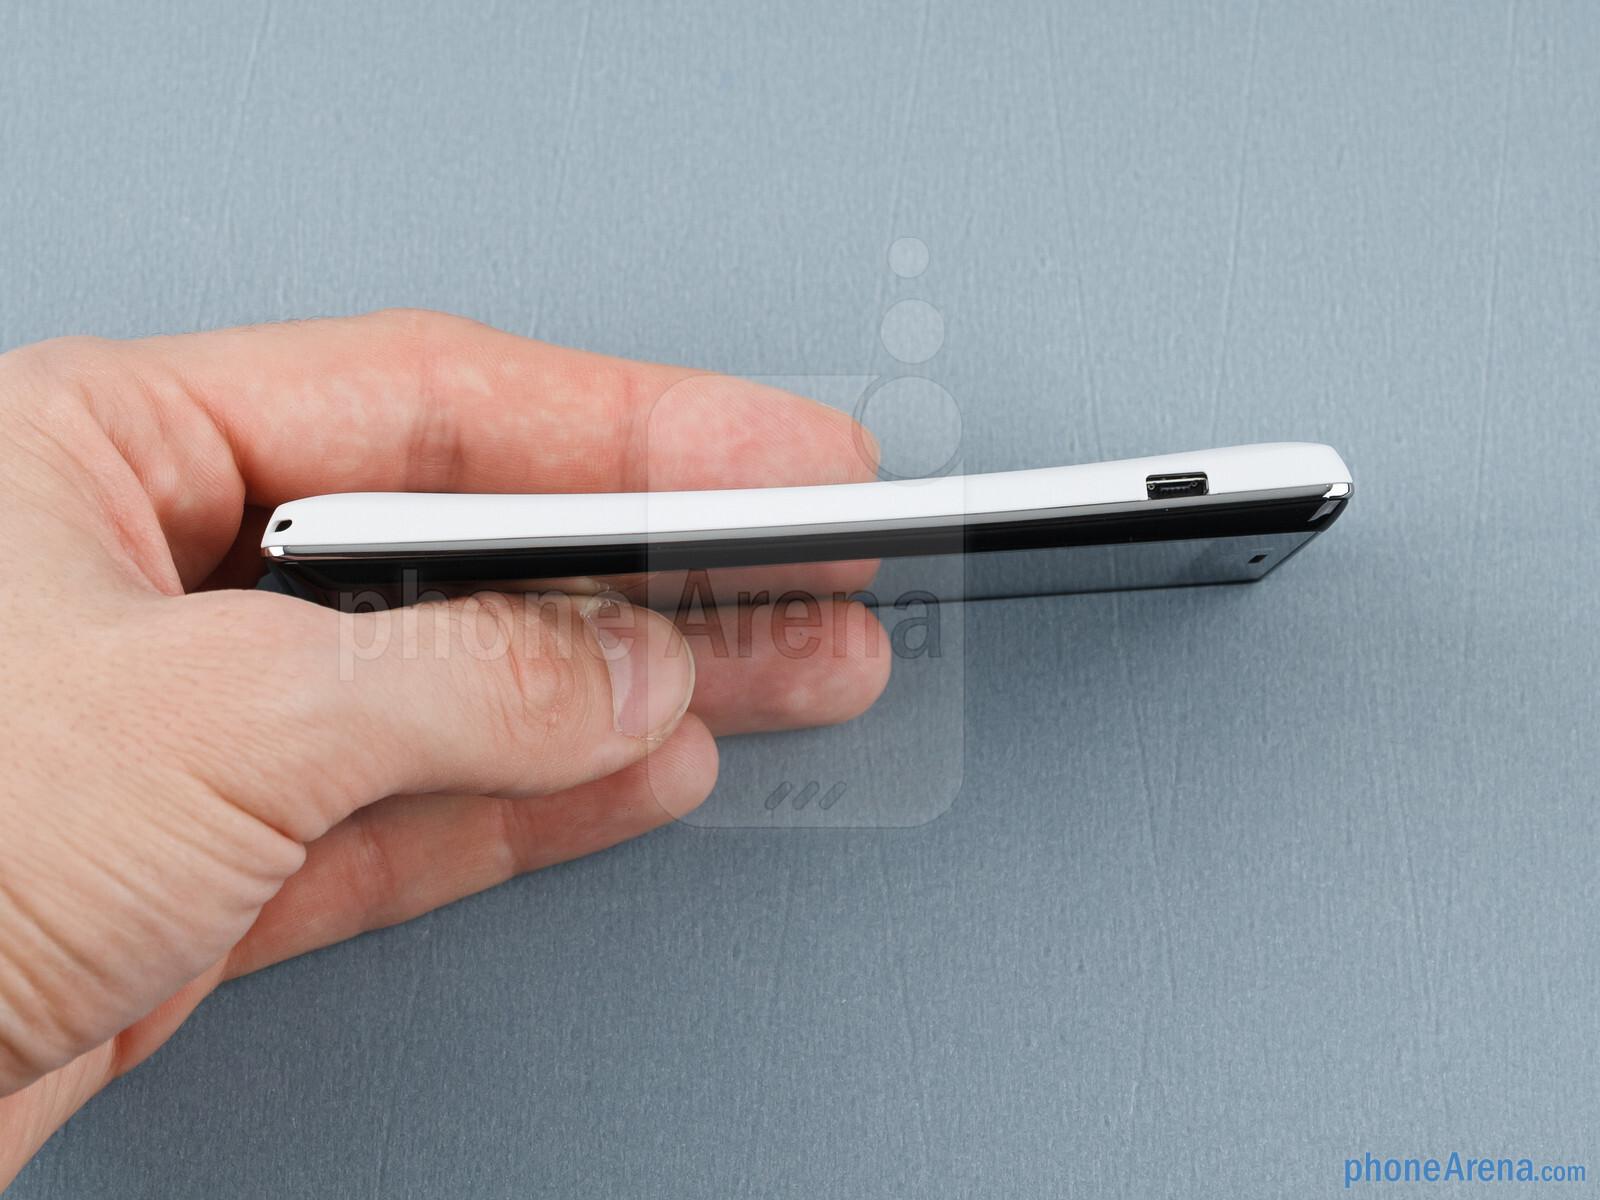 Sony Xperia J nyaman untuk menyimpan dan beroperasi dengan satu tangan Sony Xperia J Ulasan